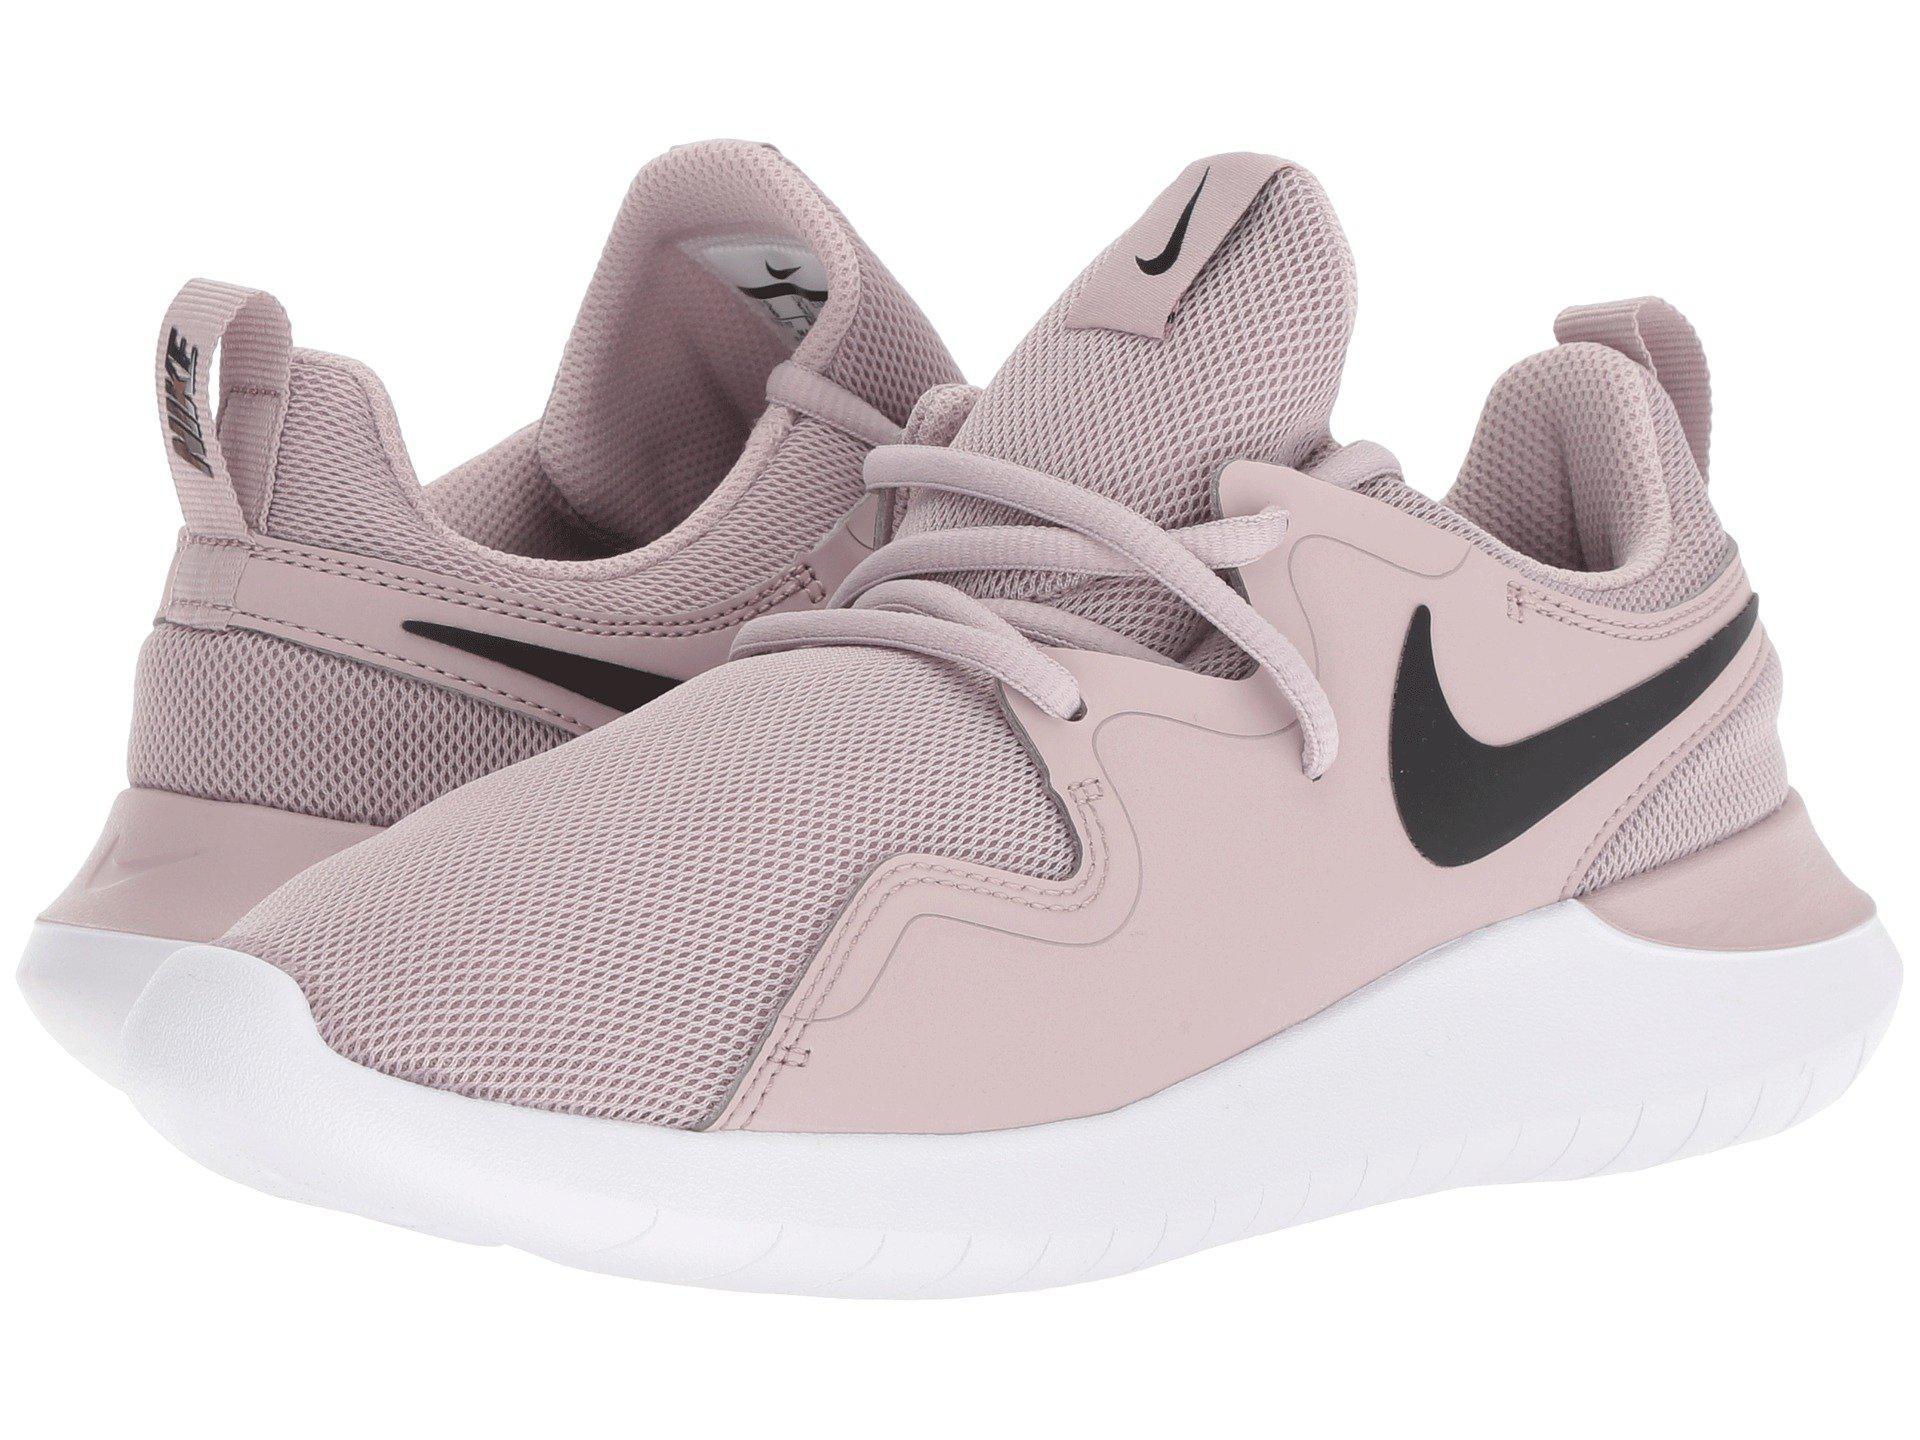 695fcc74e3b1 Lyst - Nike Tessen in Pink